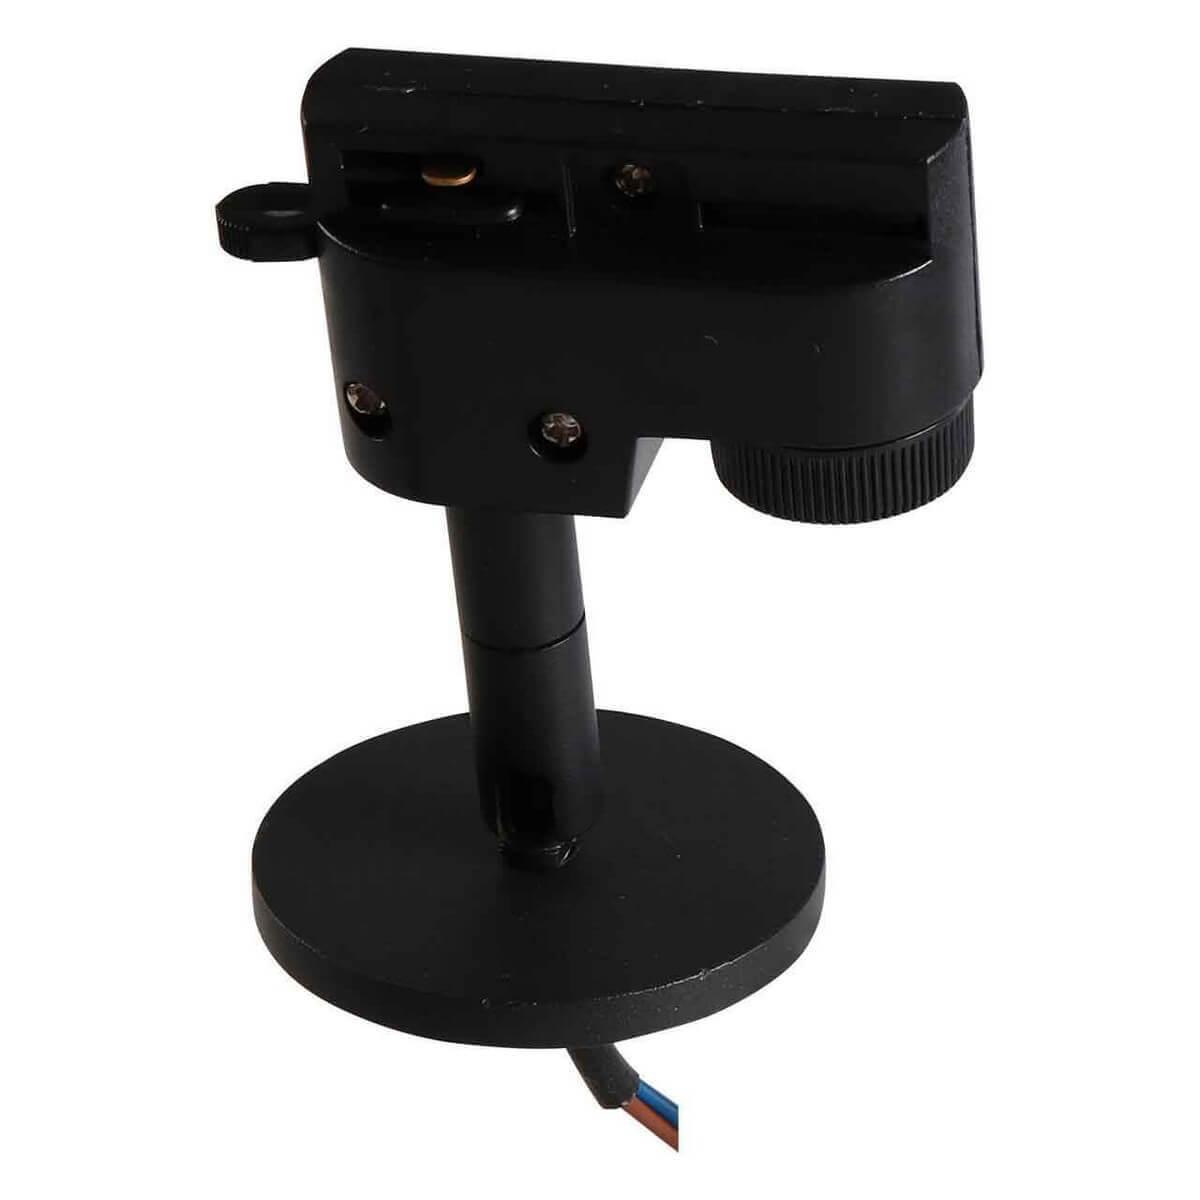 Адаптер для шинопровода Lightstar 592057 Asta Black (для однофазного шинопровода)